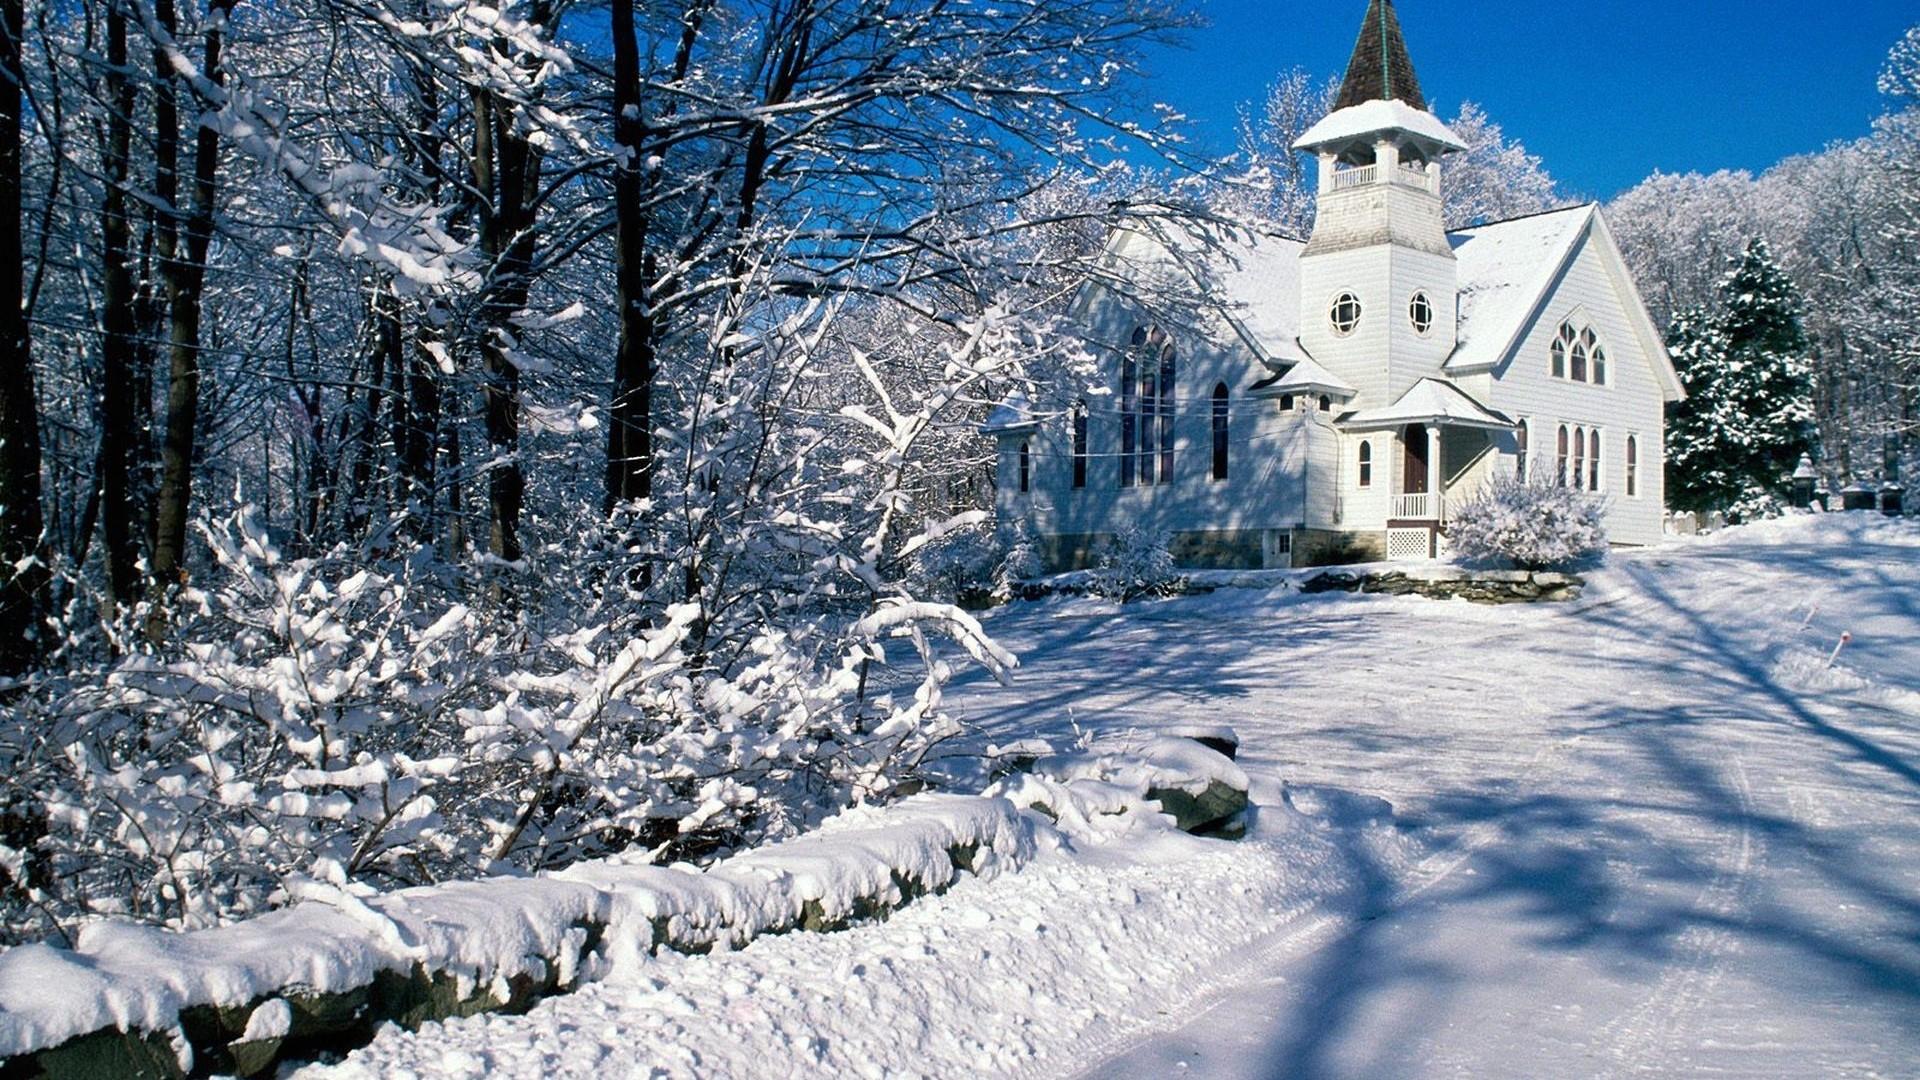 Winter Wonderland Download Wallpaper